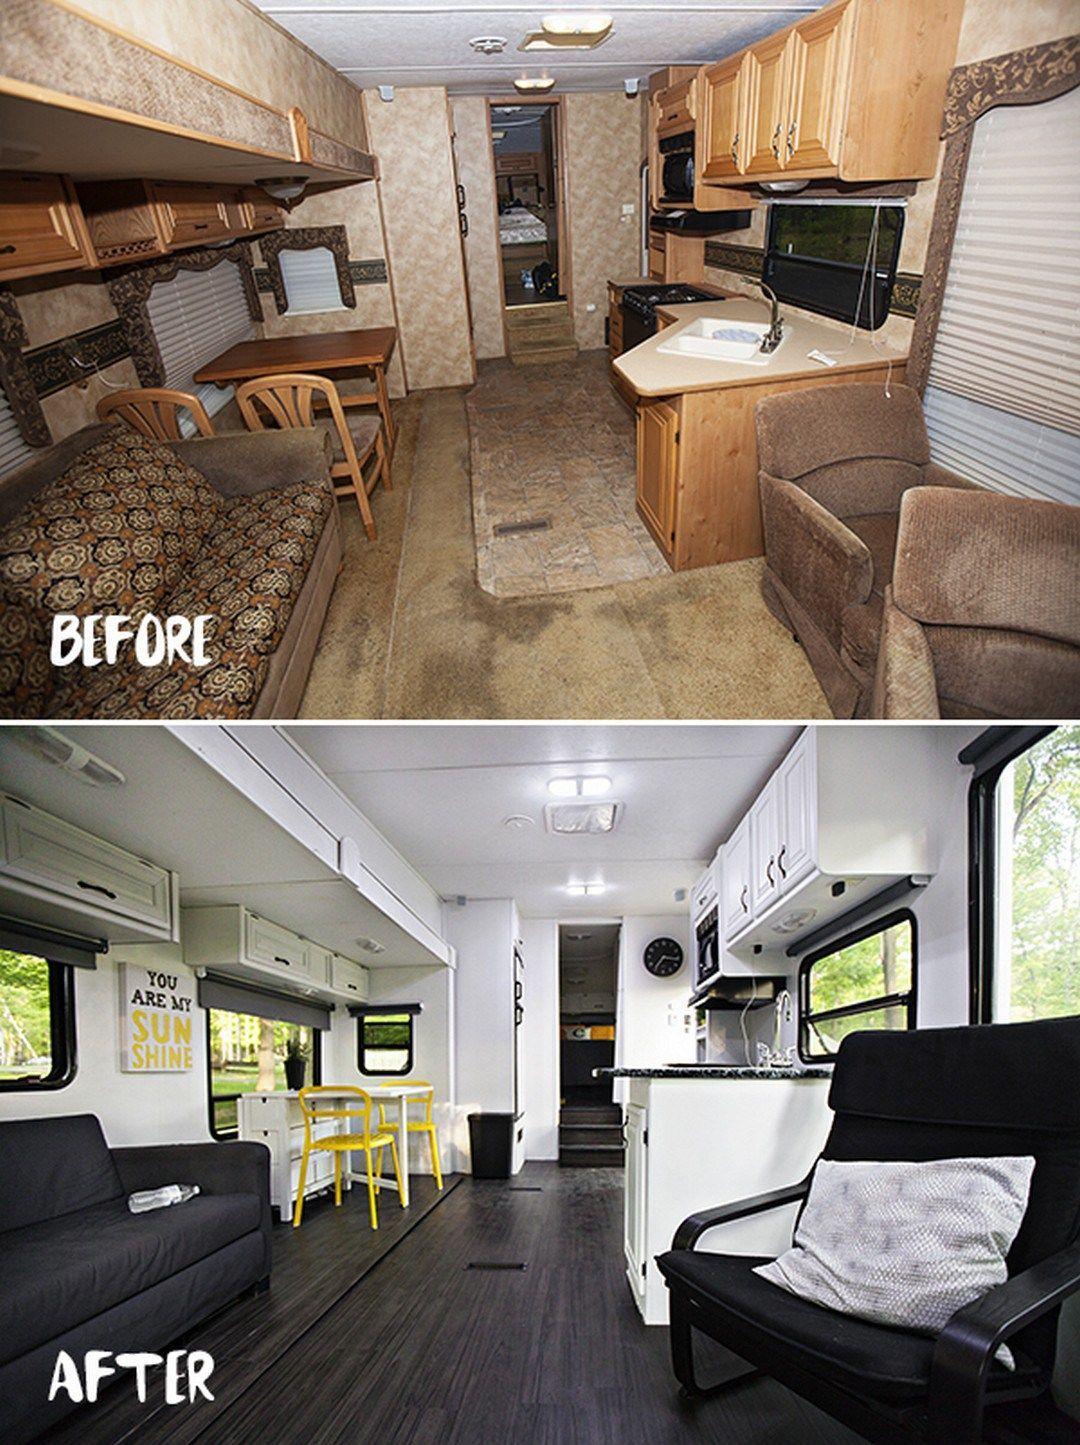 5th wheel master bedroom   Best RV Camper Interior Remodel Ideas   Interior Remodeling